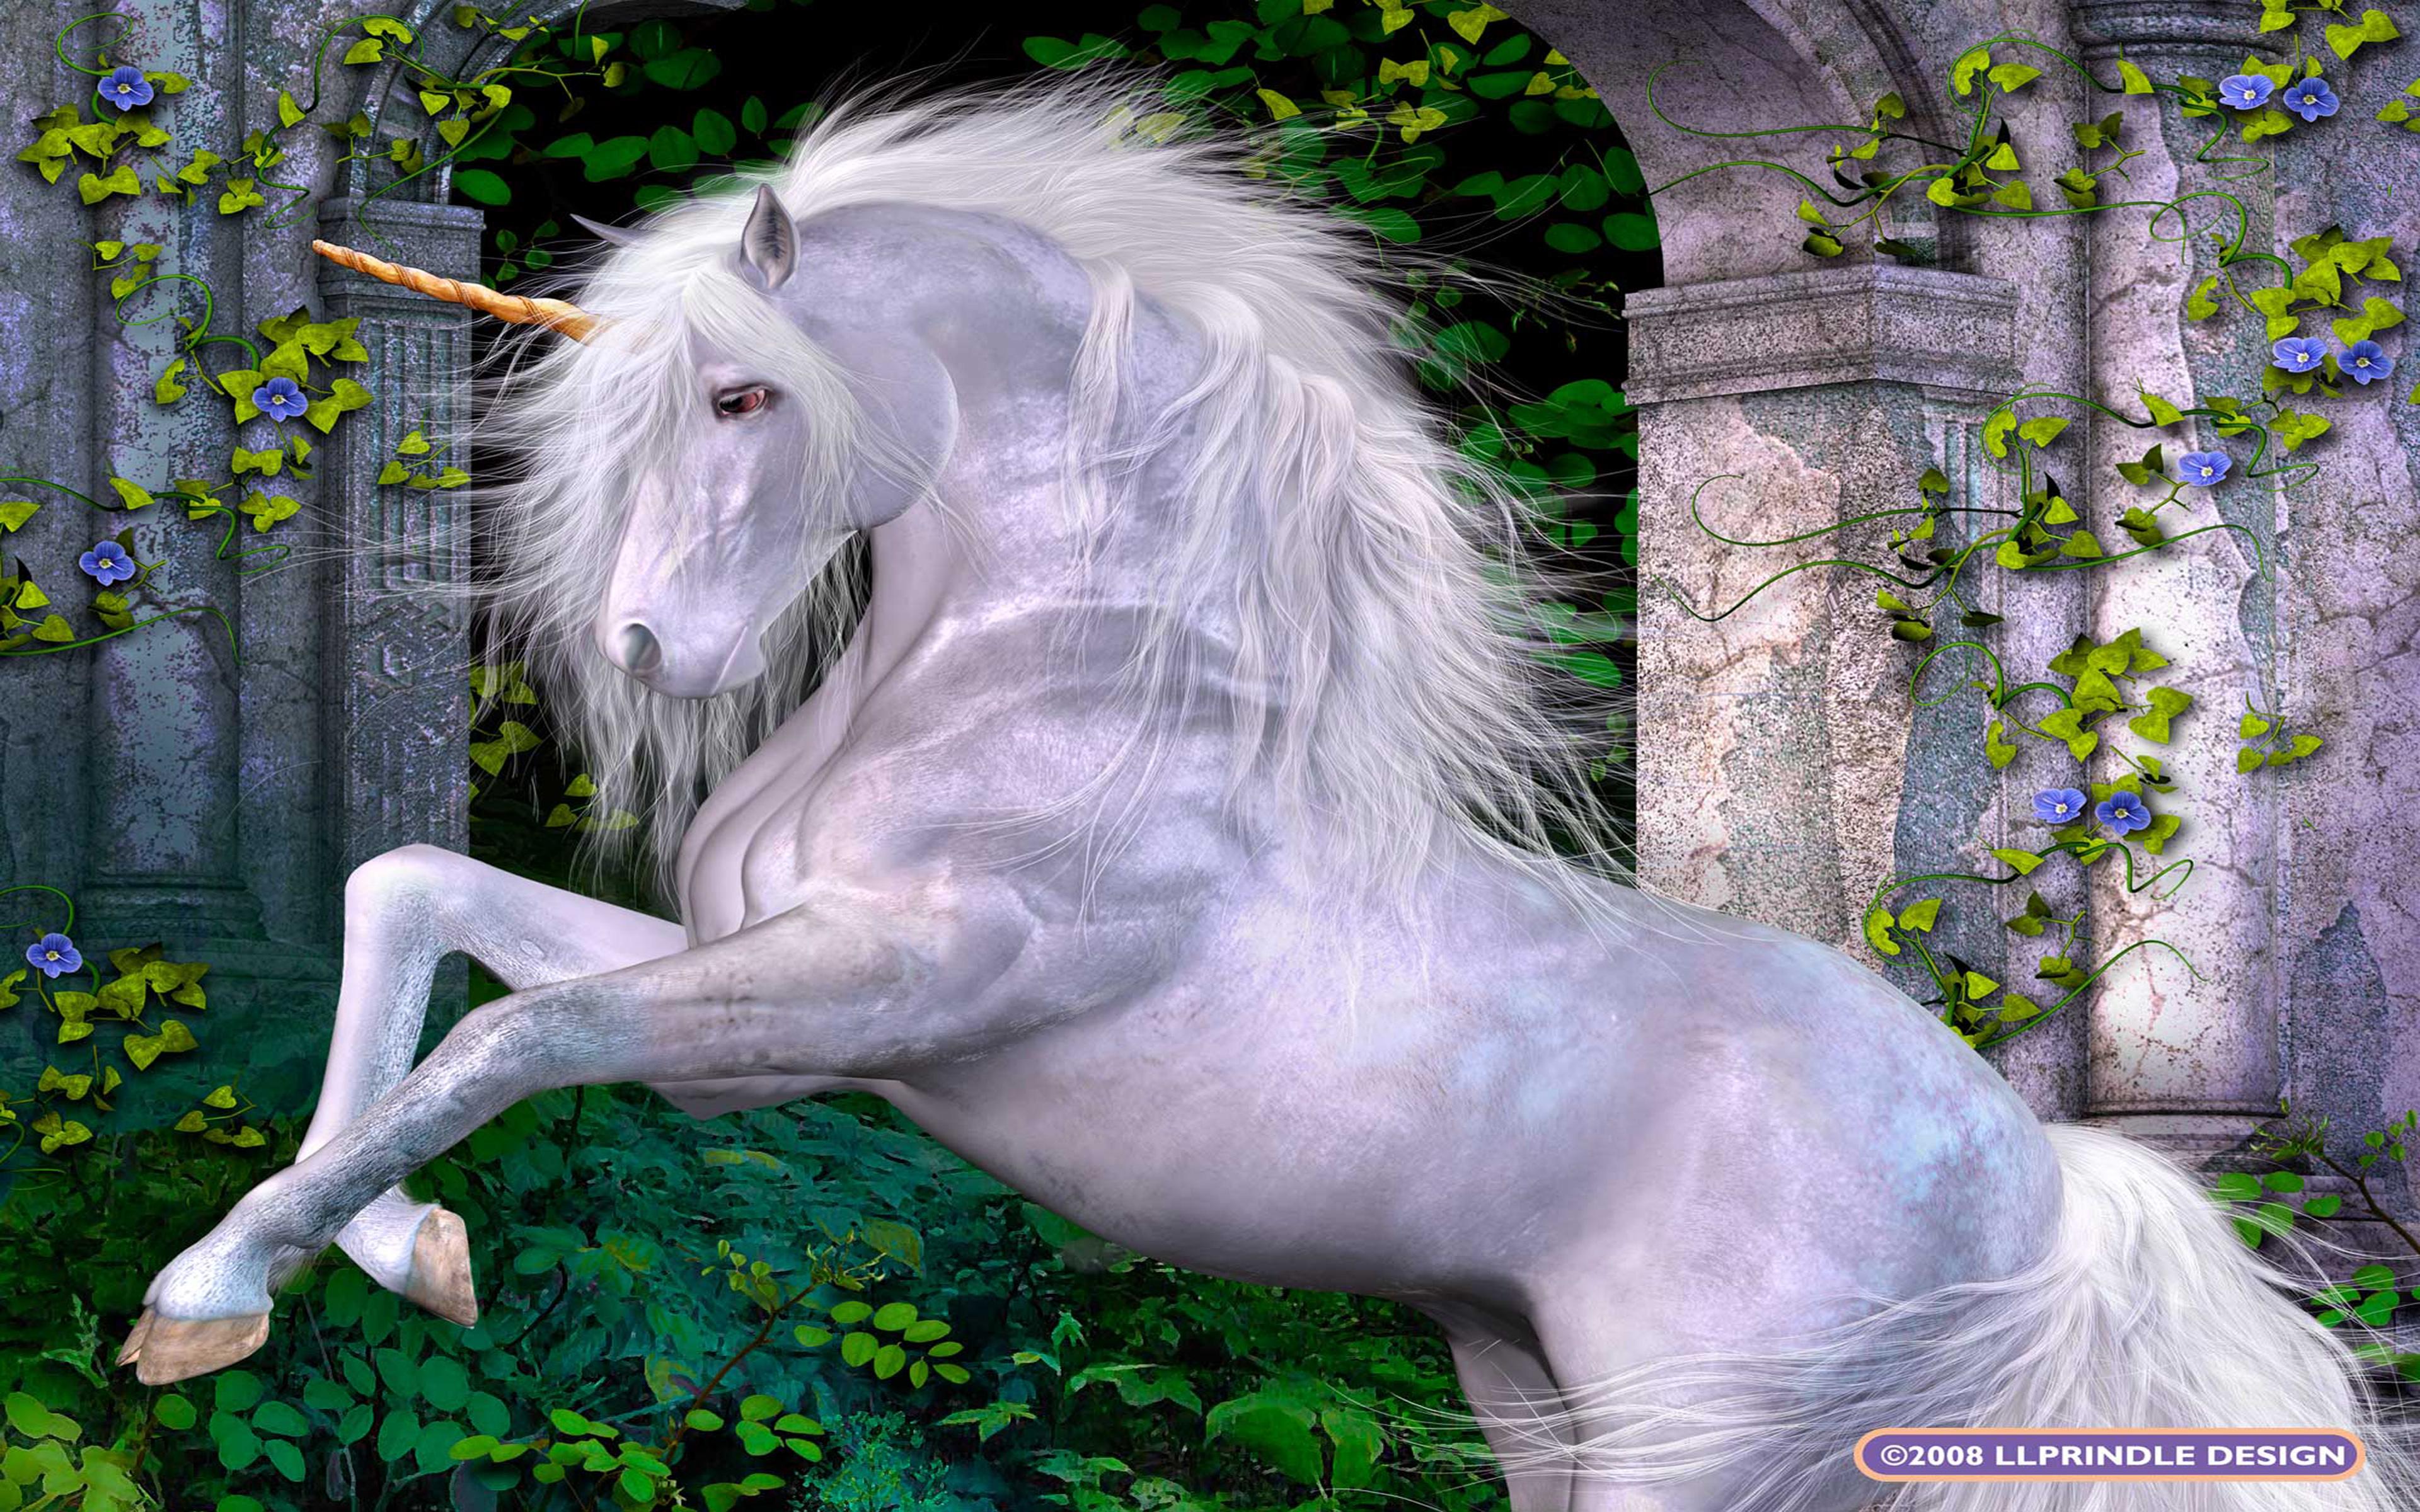 Cute Lock Screen Wallpaper Hd Silky Unicorn Art Picture Wallpaper Hd Wallpapers13 Com